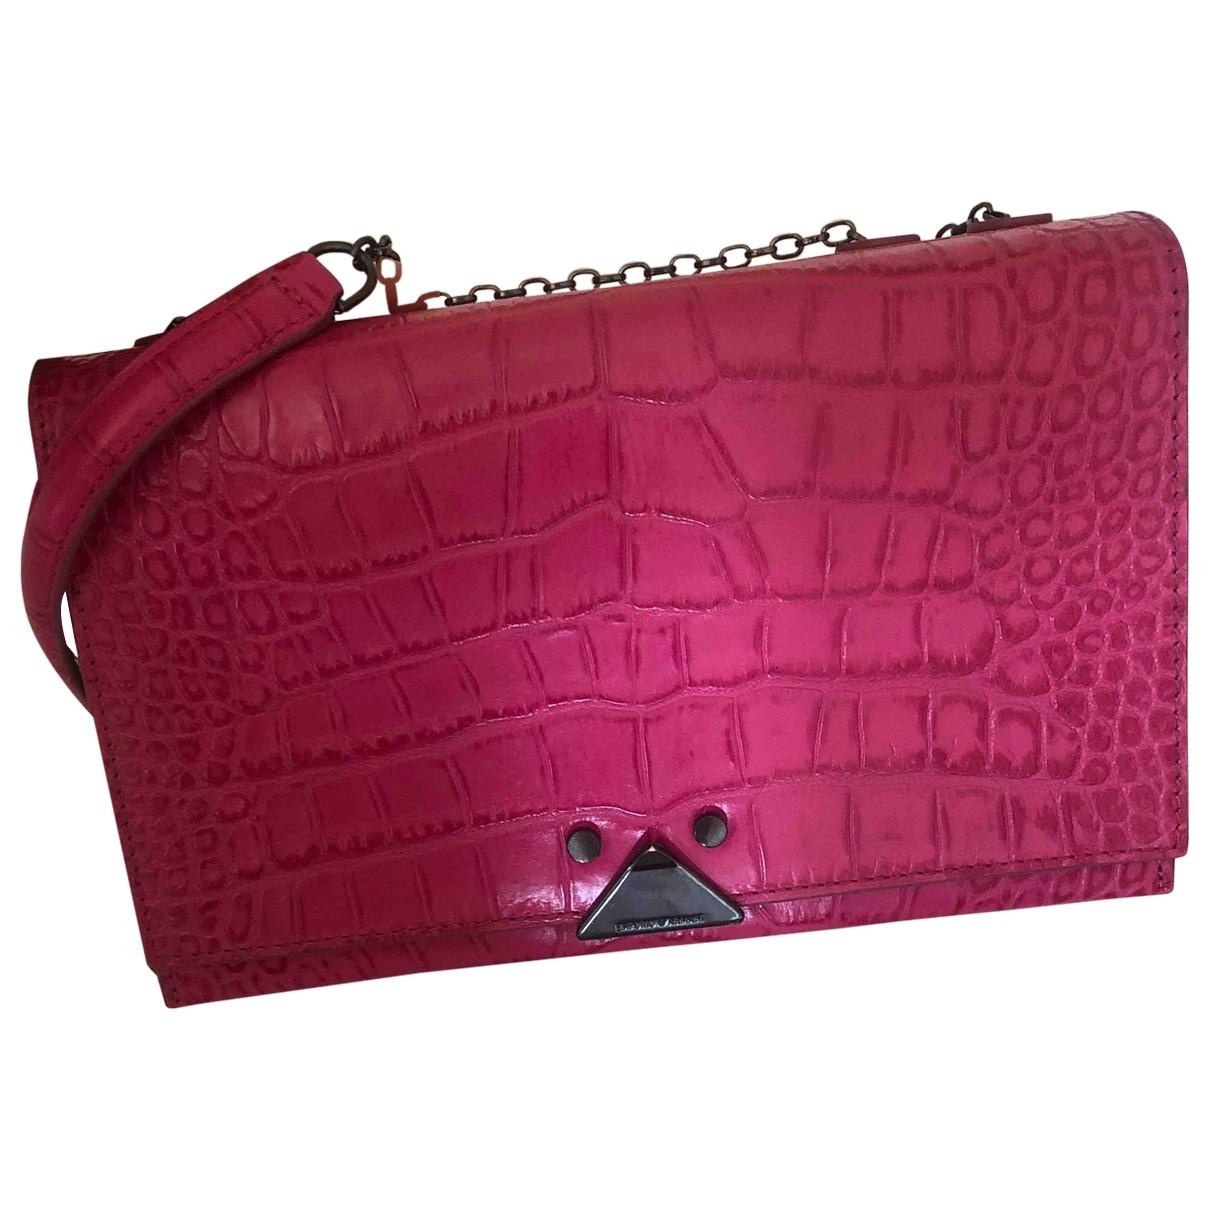 Giorgio Armani \N Pink Leather Clutch bag for Women \N